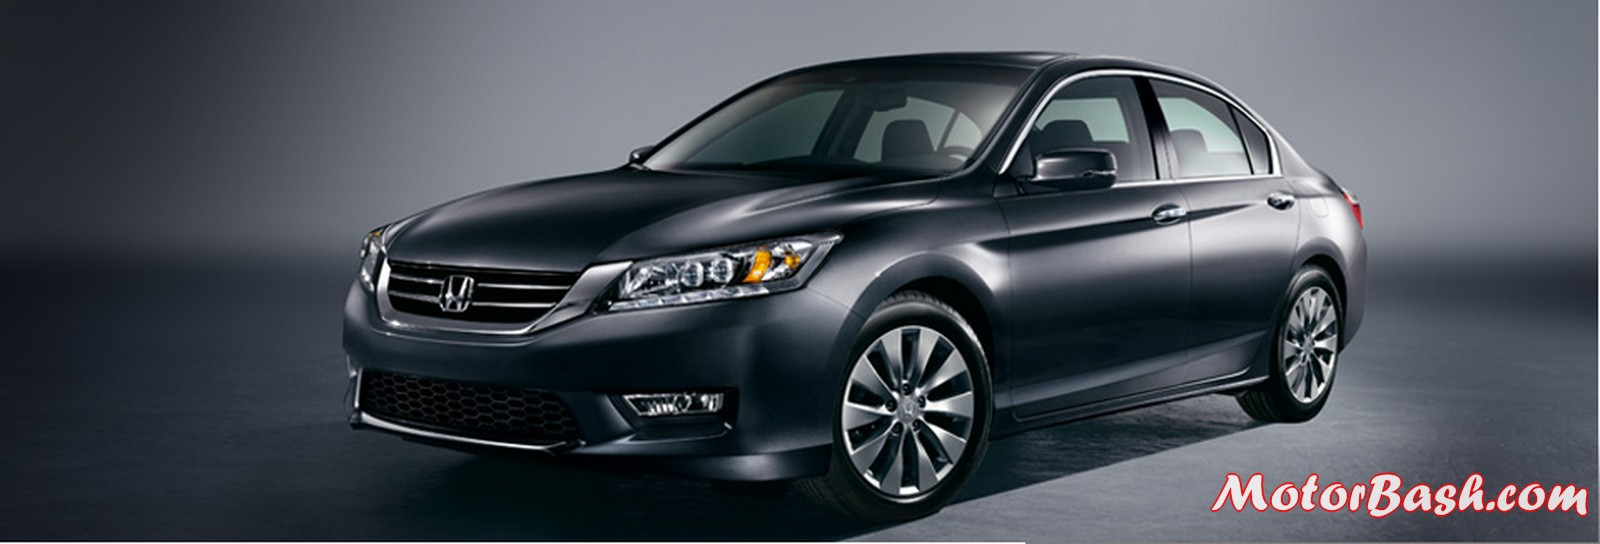 New_2013_Honda_Accord